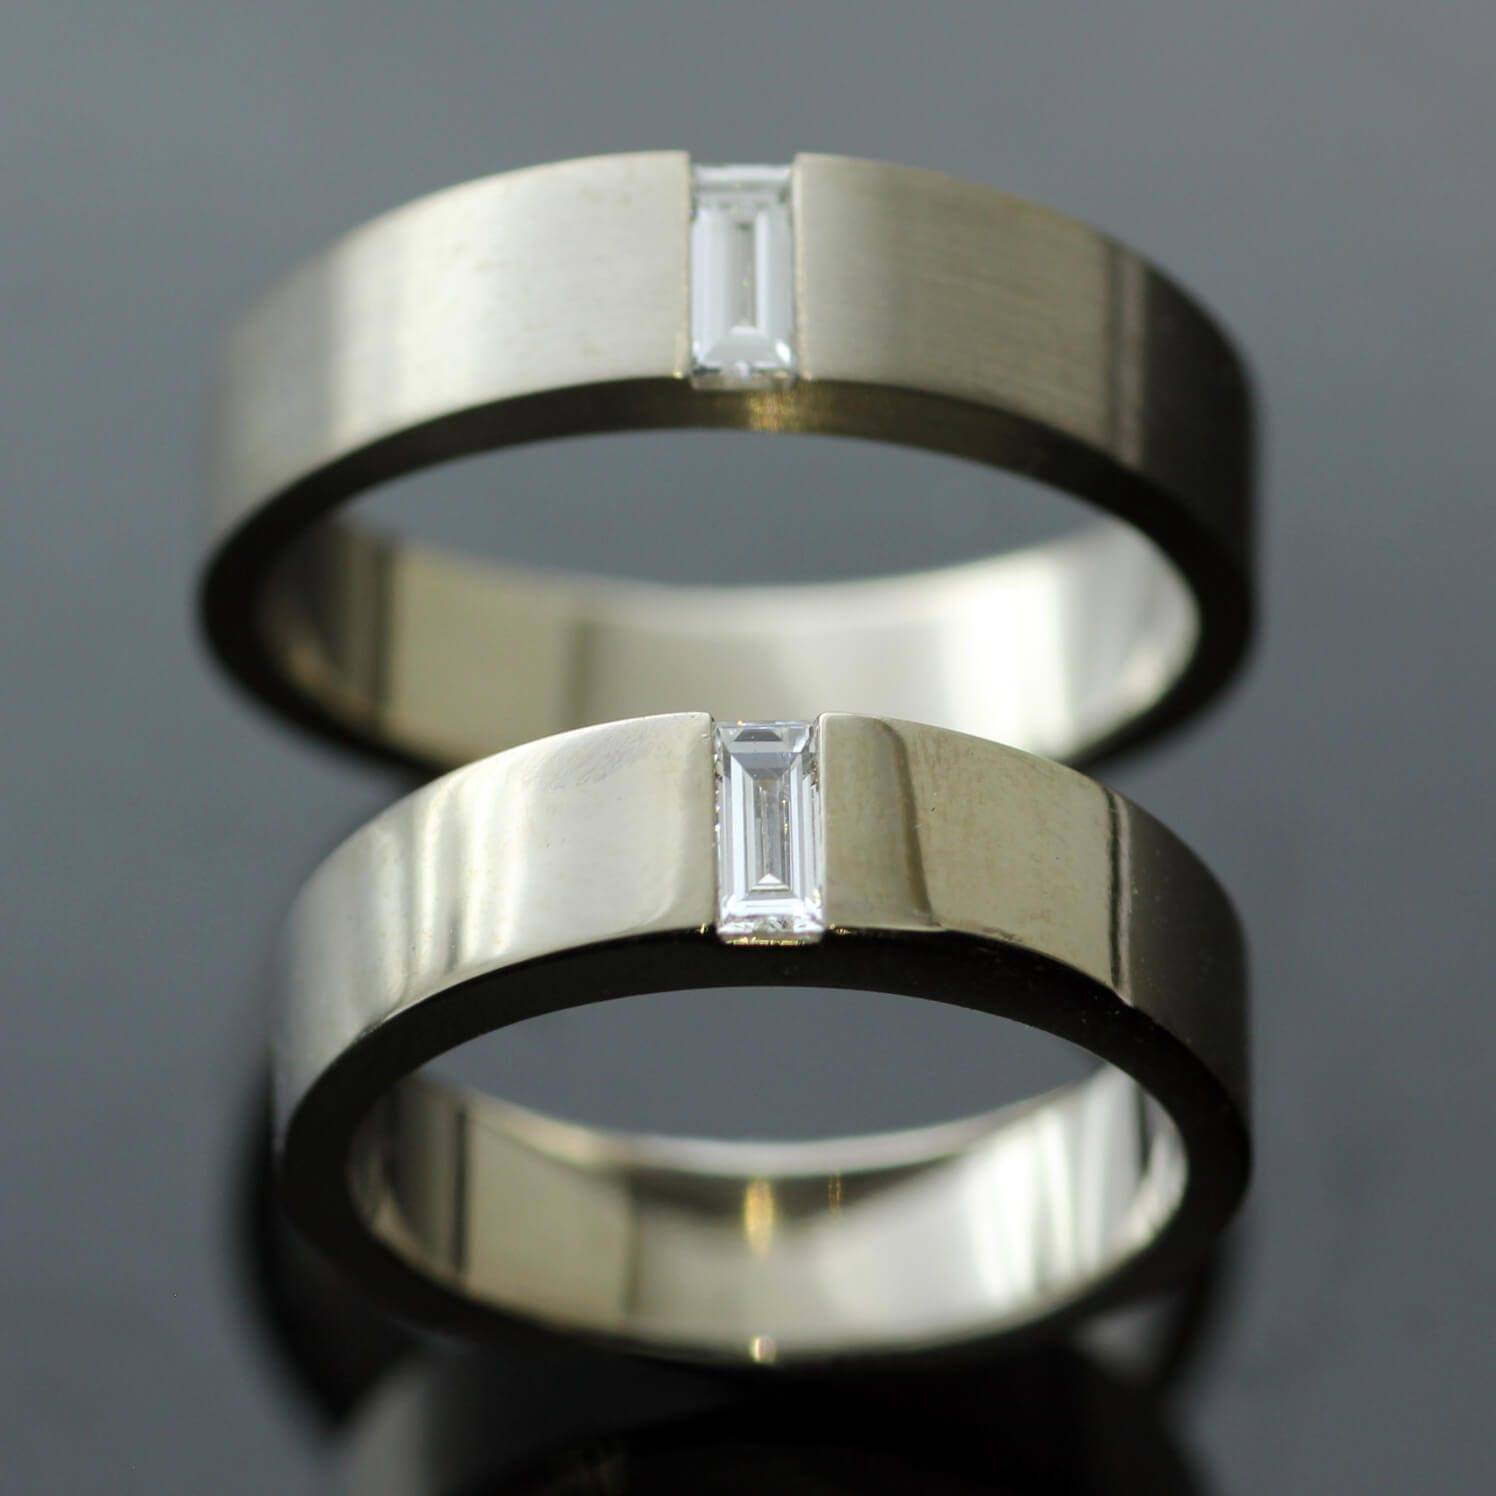 Unique bespoke Diamond wedding bands